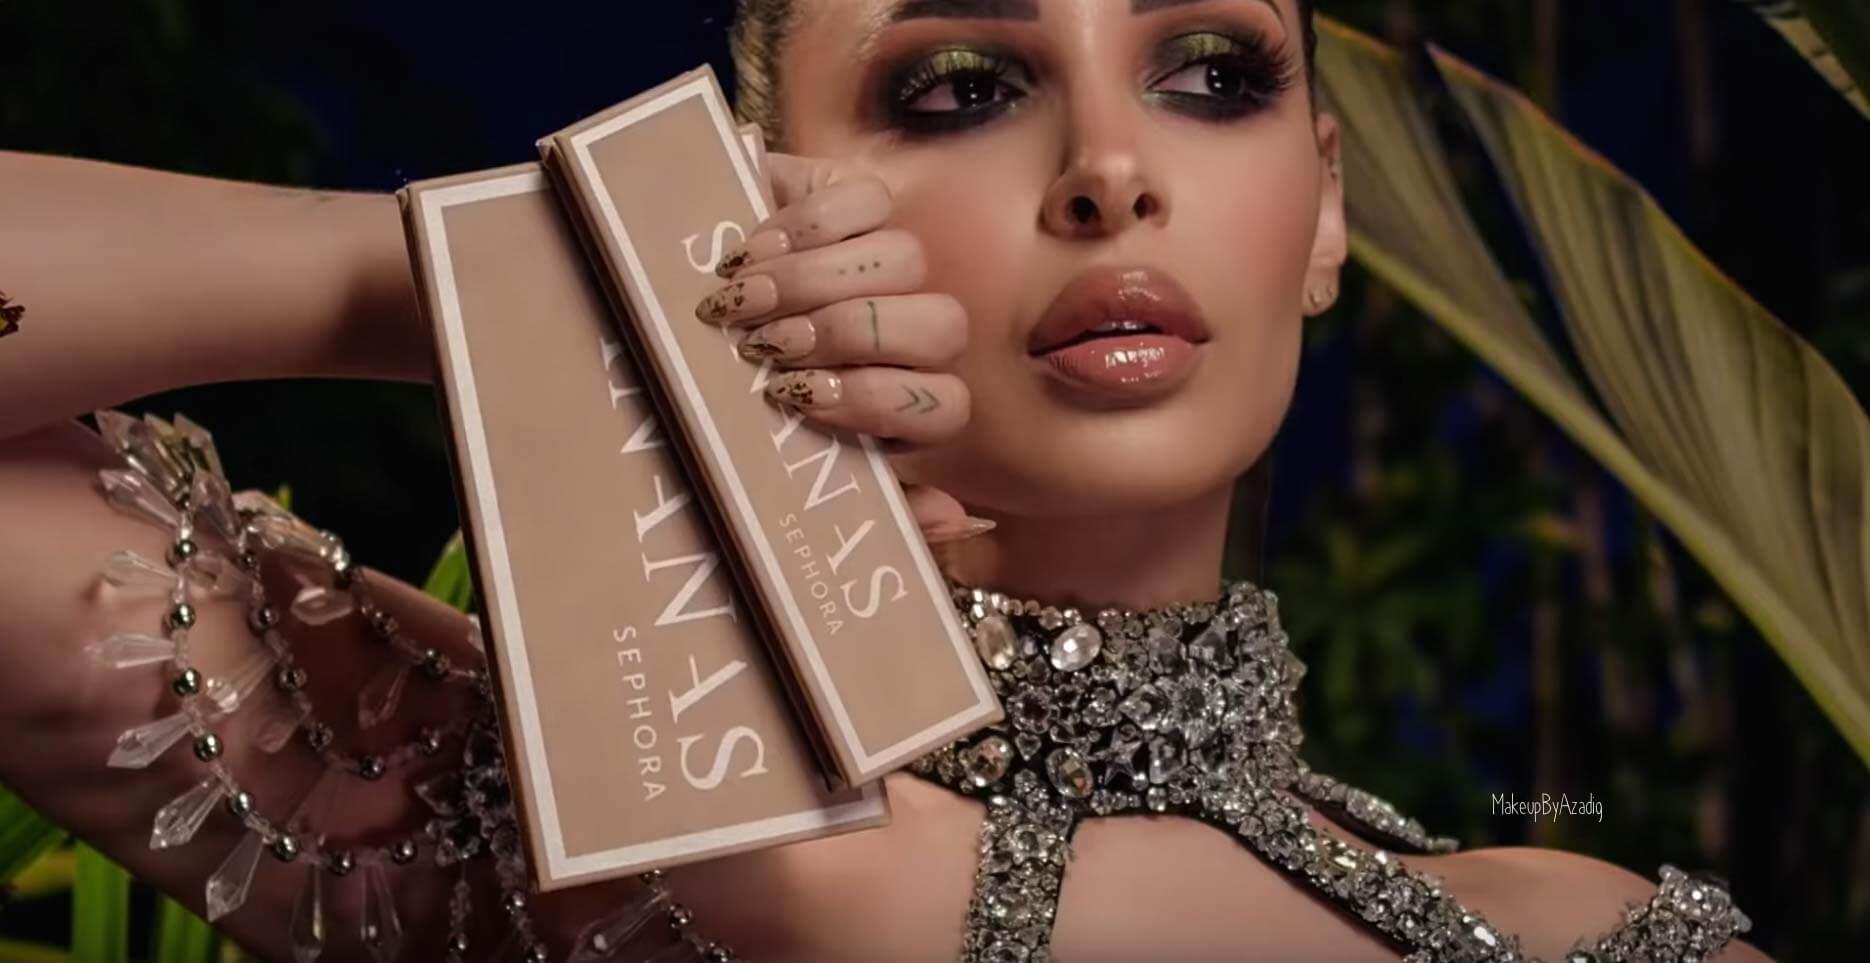 revue-deuxieme-palette-collaboration-2020-sananas-sephora-france-teintes-fards-paupieres-couleurs-avis-prix-swatch-makeupbyazadig-date-sortie-beautynews-partenariat